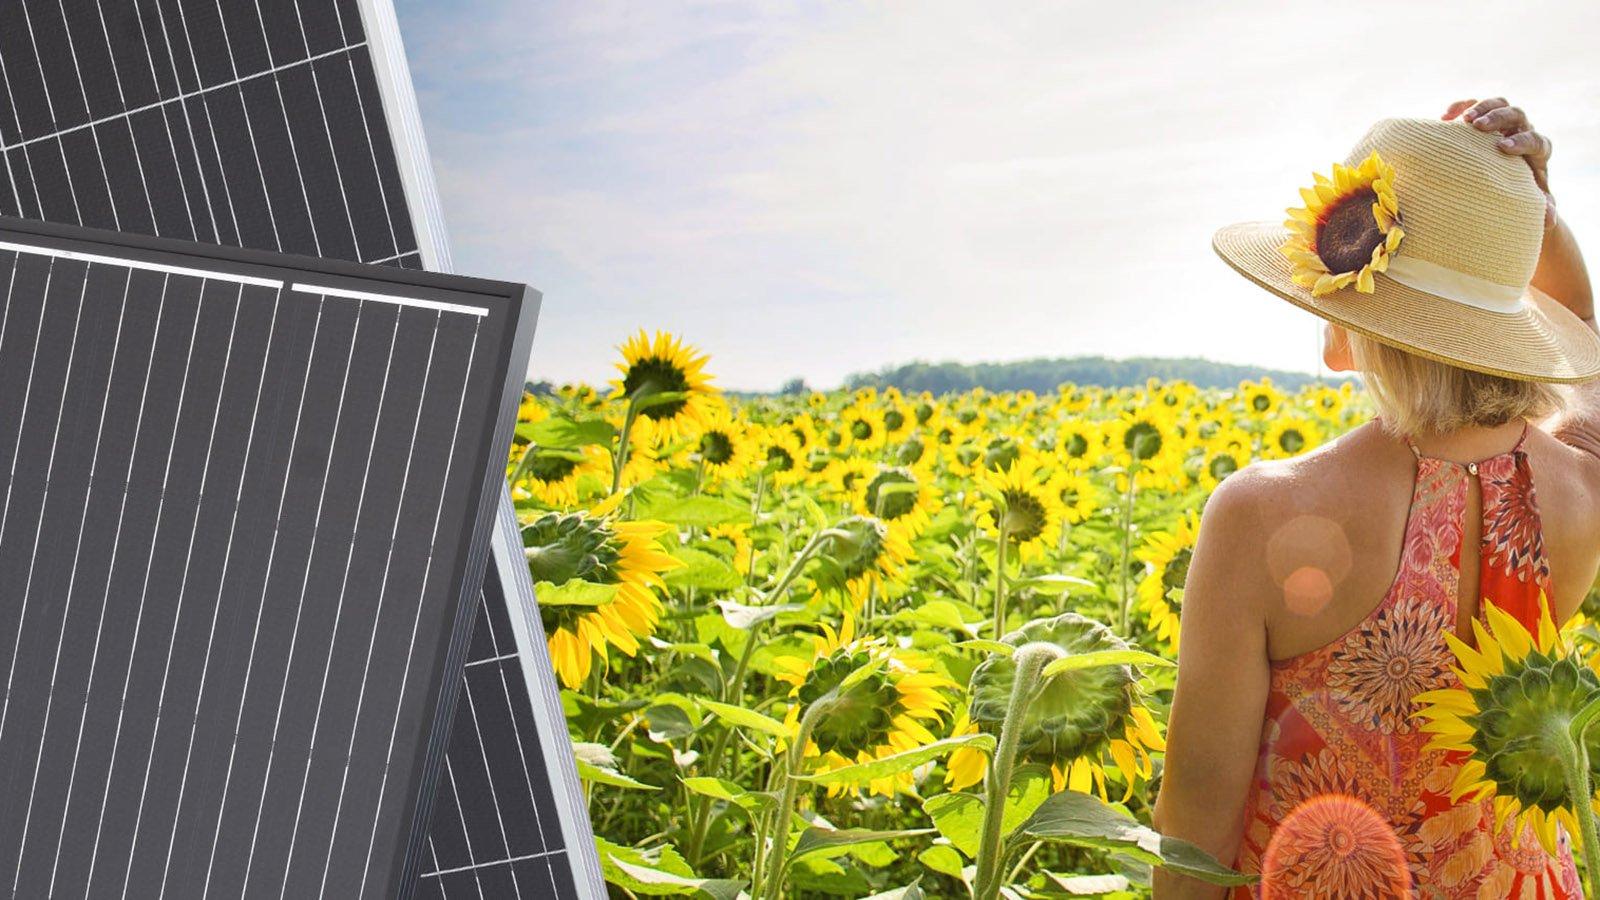 158.75mm PERC Mono Solar Panel